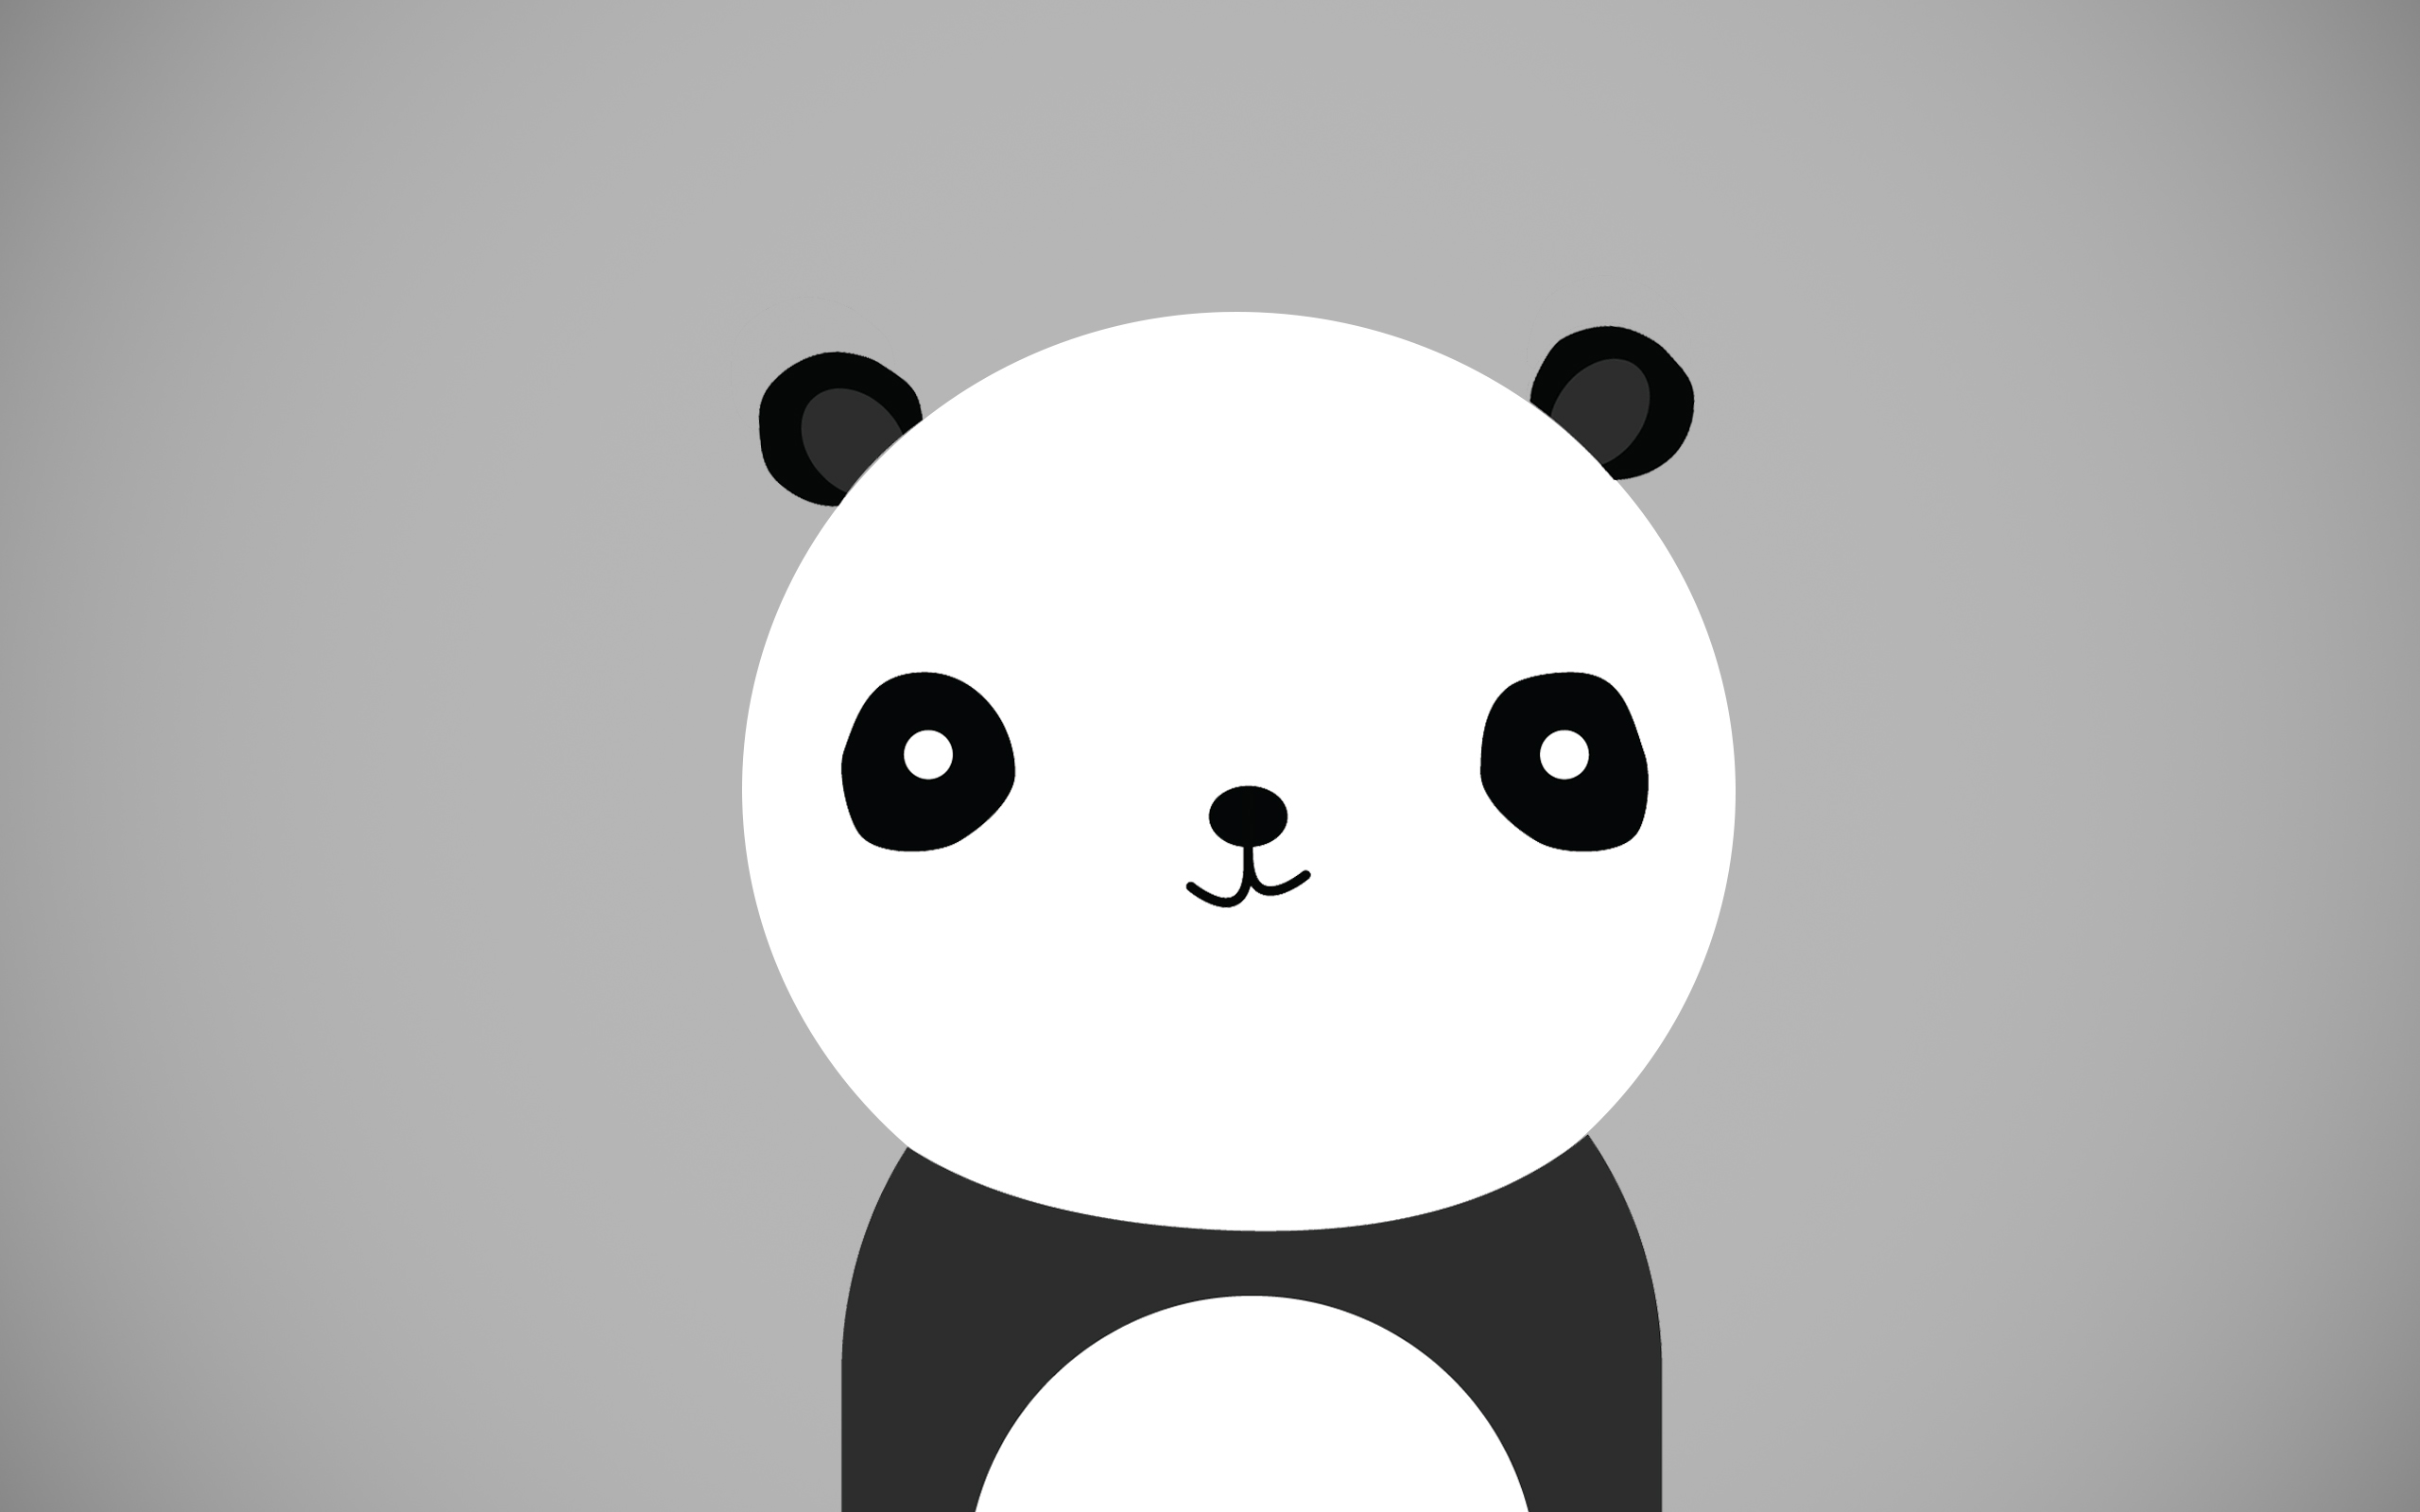 Cute panda tumblr themes - photo#23